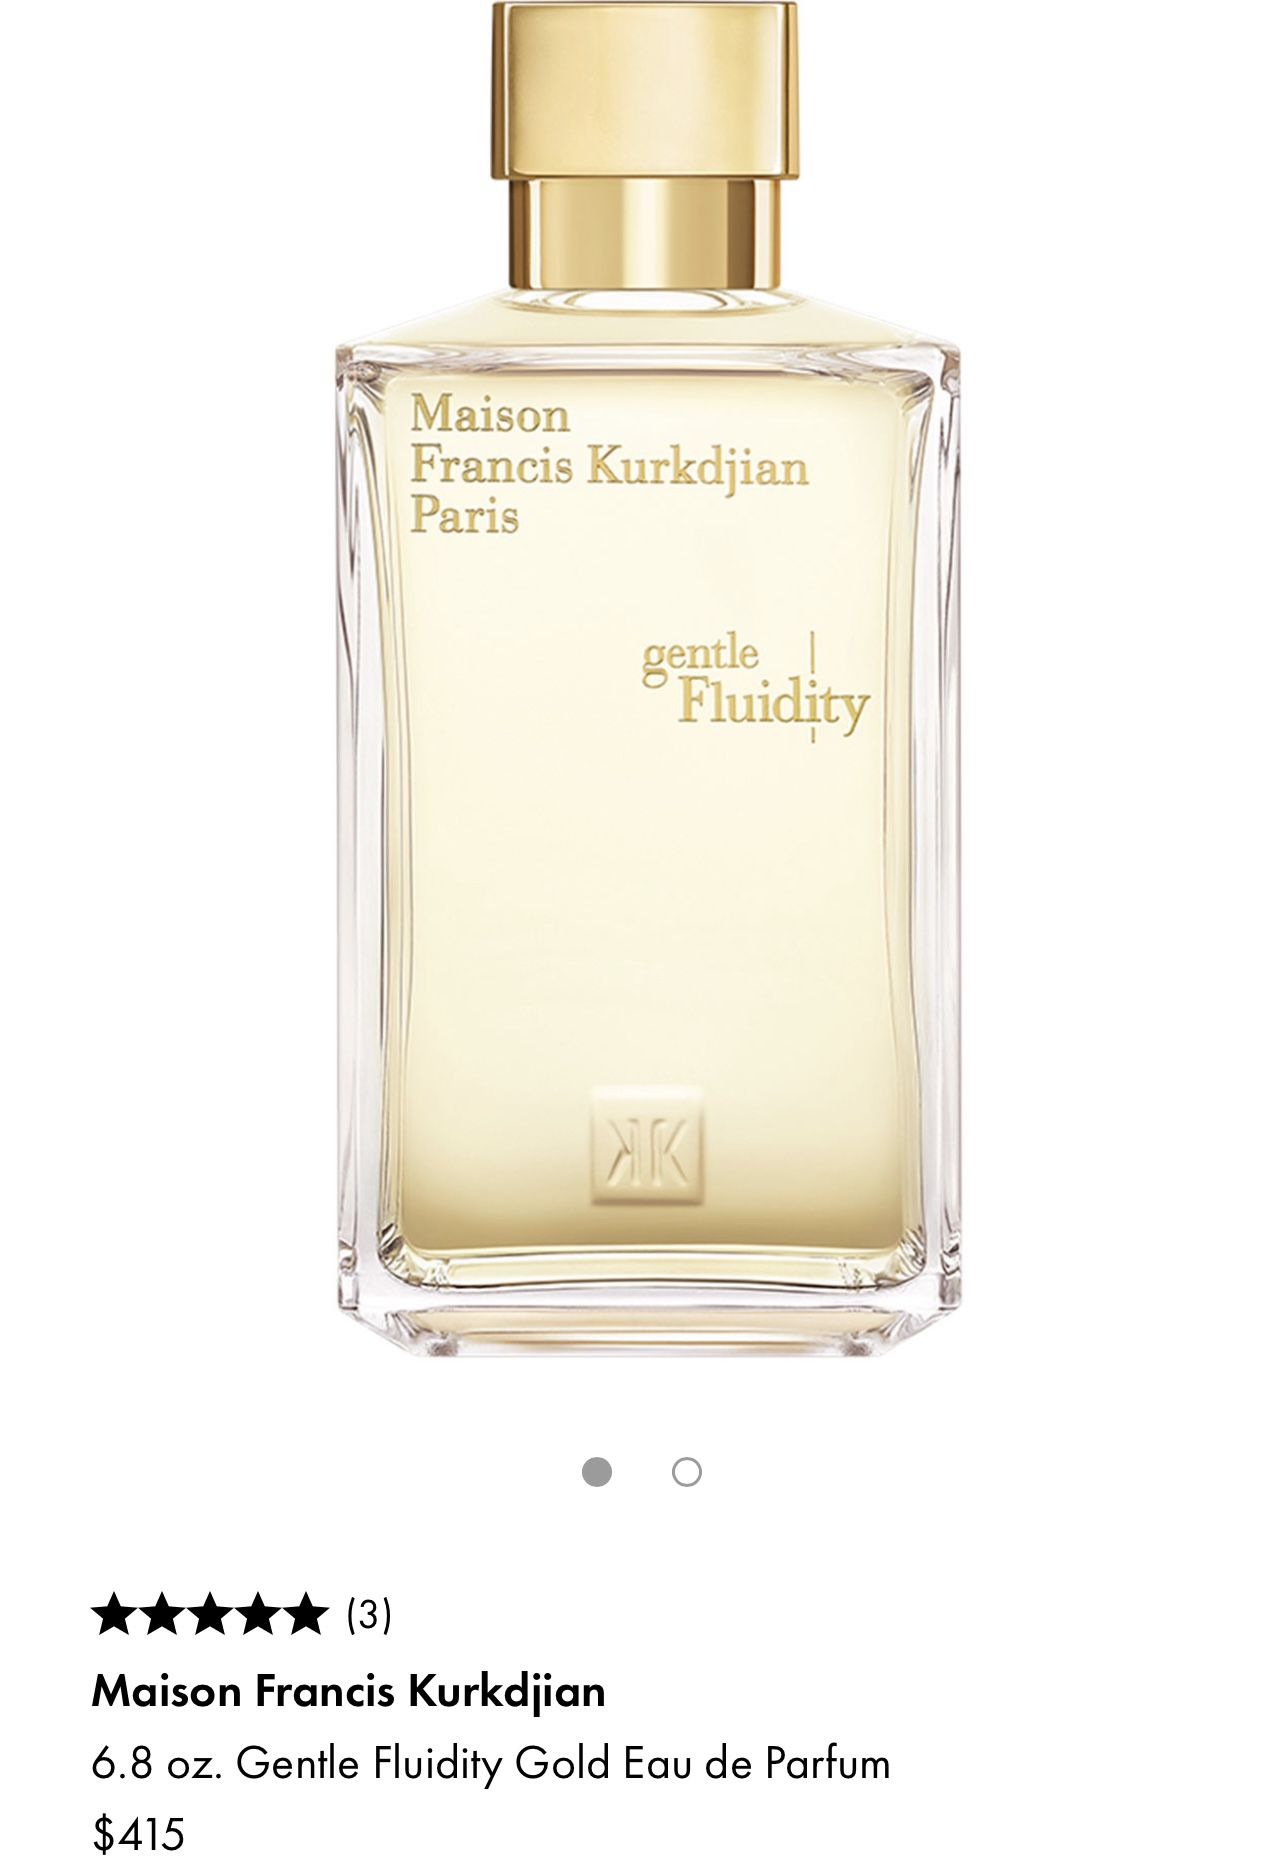 Cologne Maison Francis Kurkdjian / Gentle Fluidity Parfum 6.8 Oz